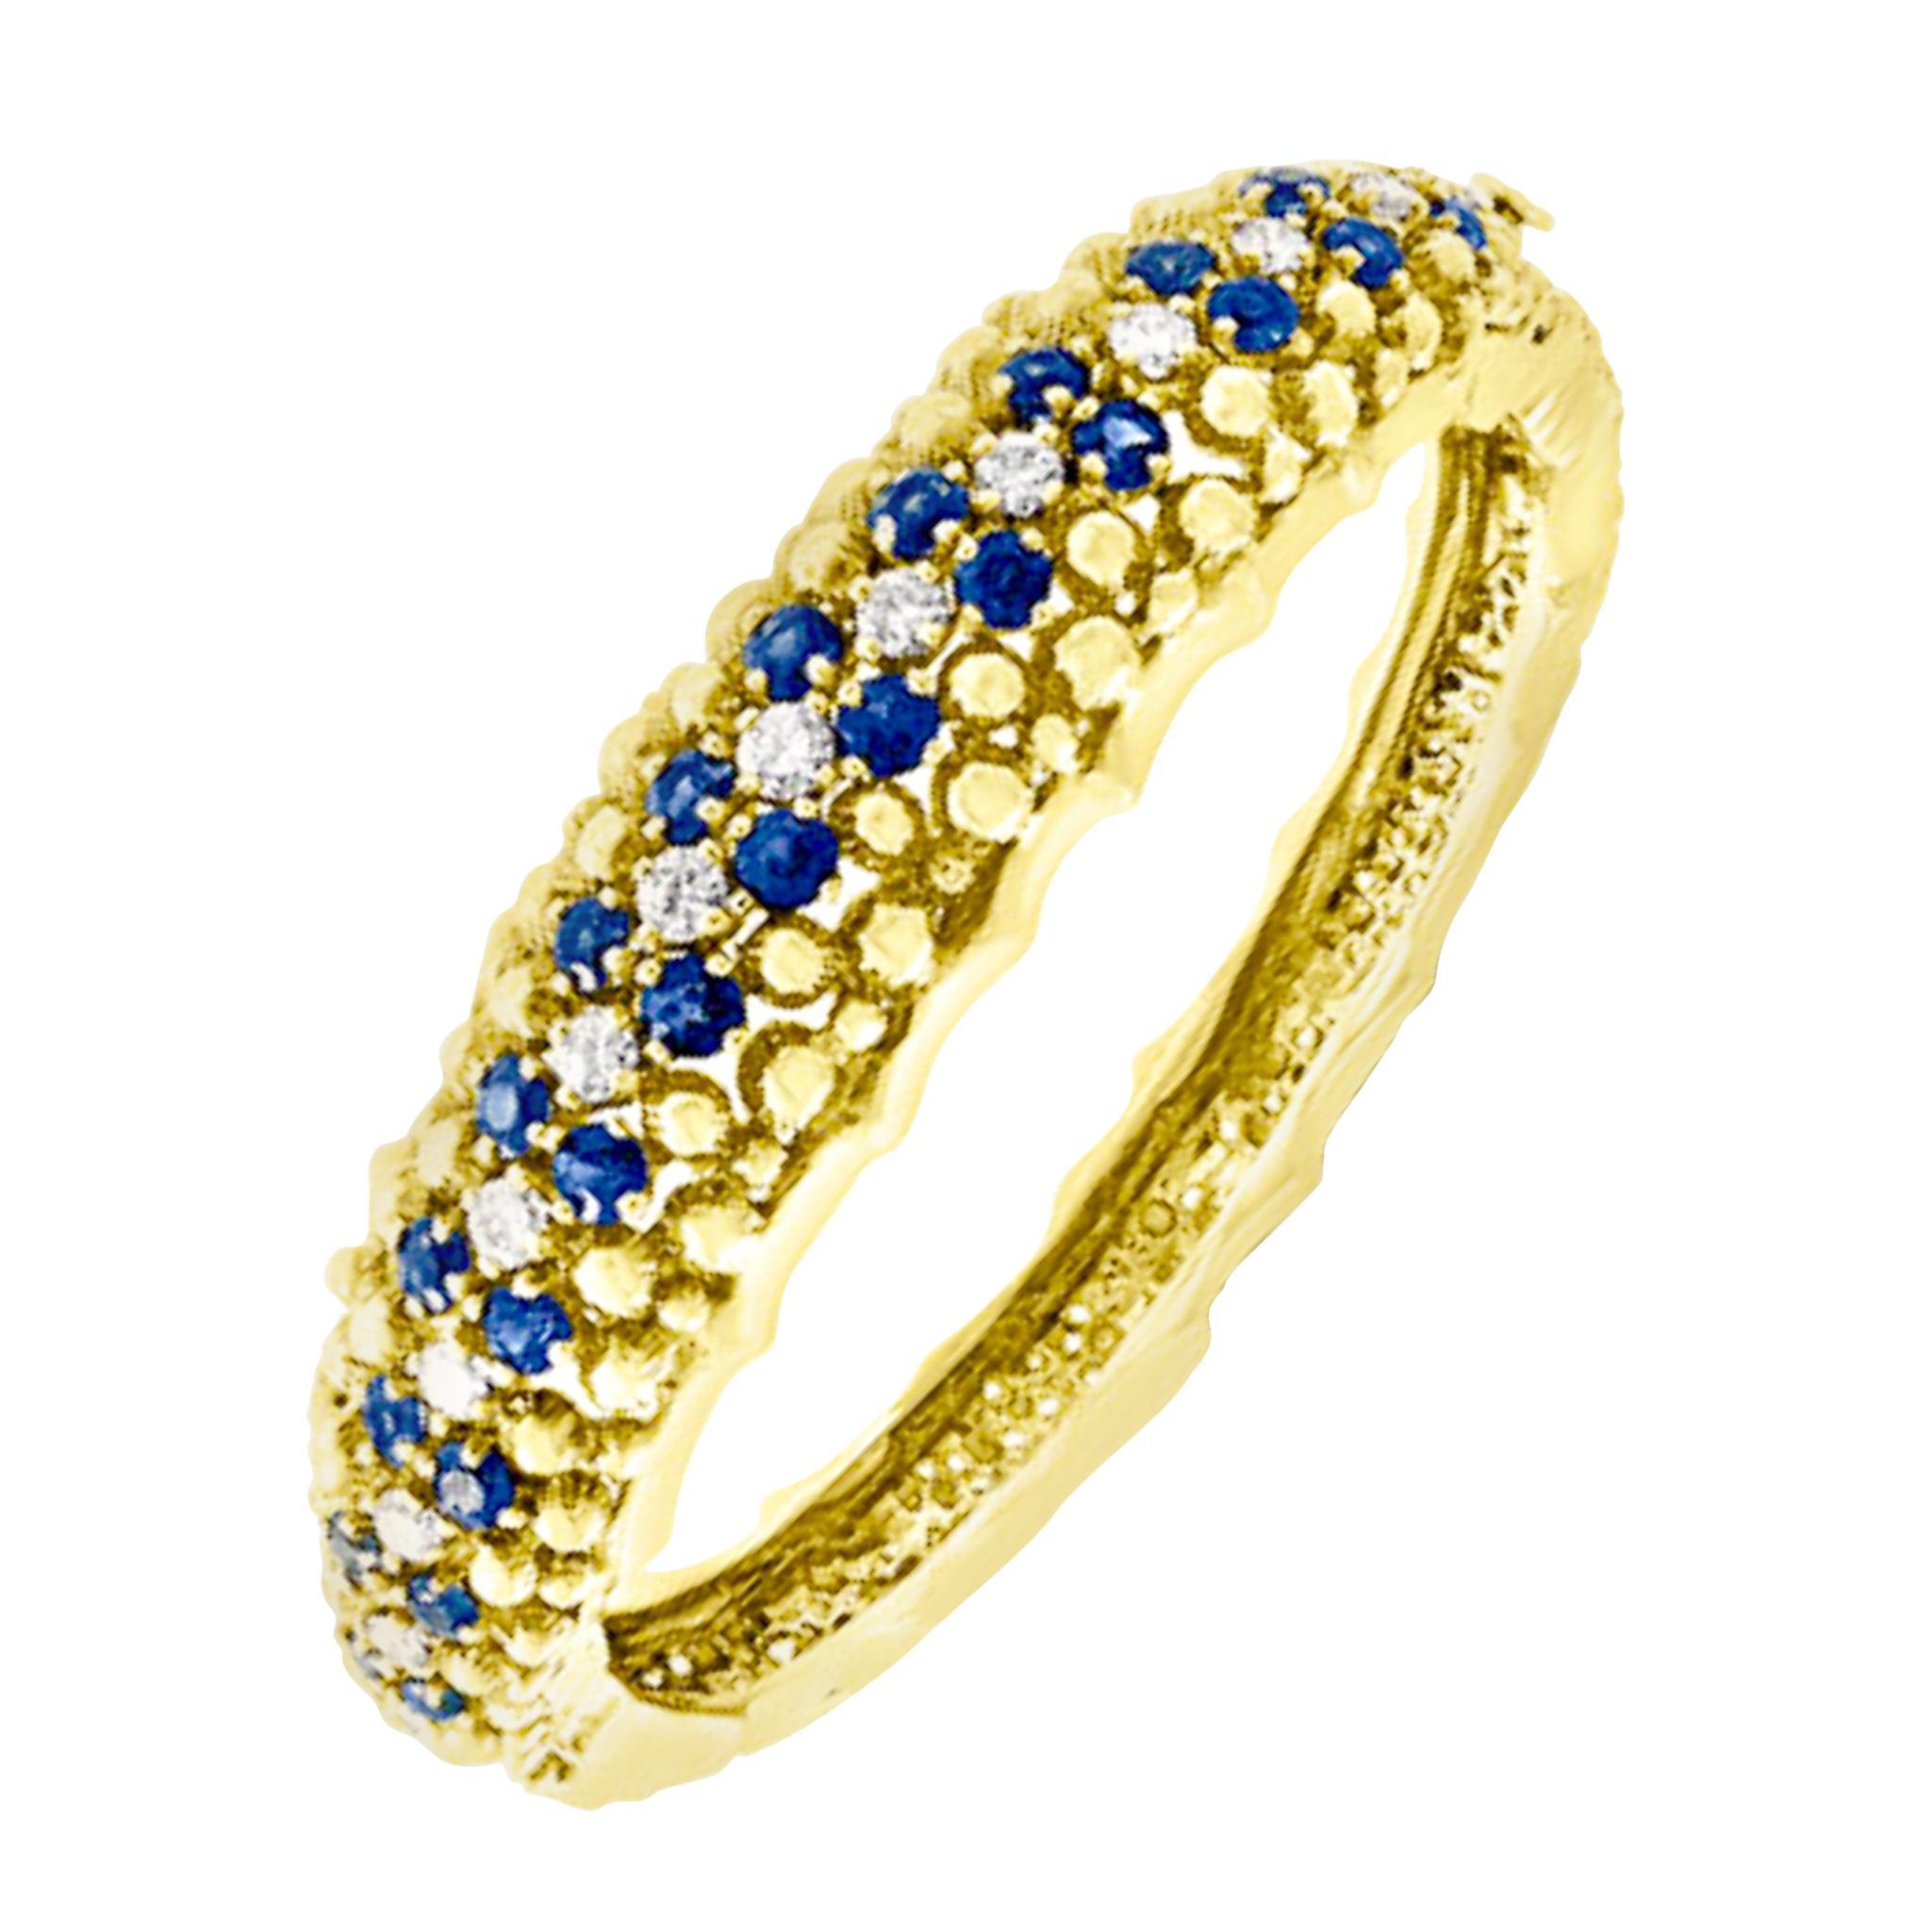 5 Carat Sapphire and 1.5 Carat Diamond Cuff Bangle Bracelet in 18 Karat Gold